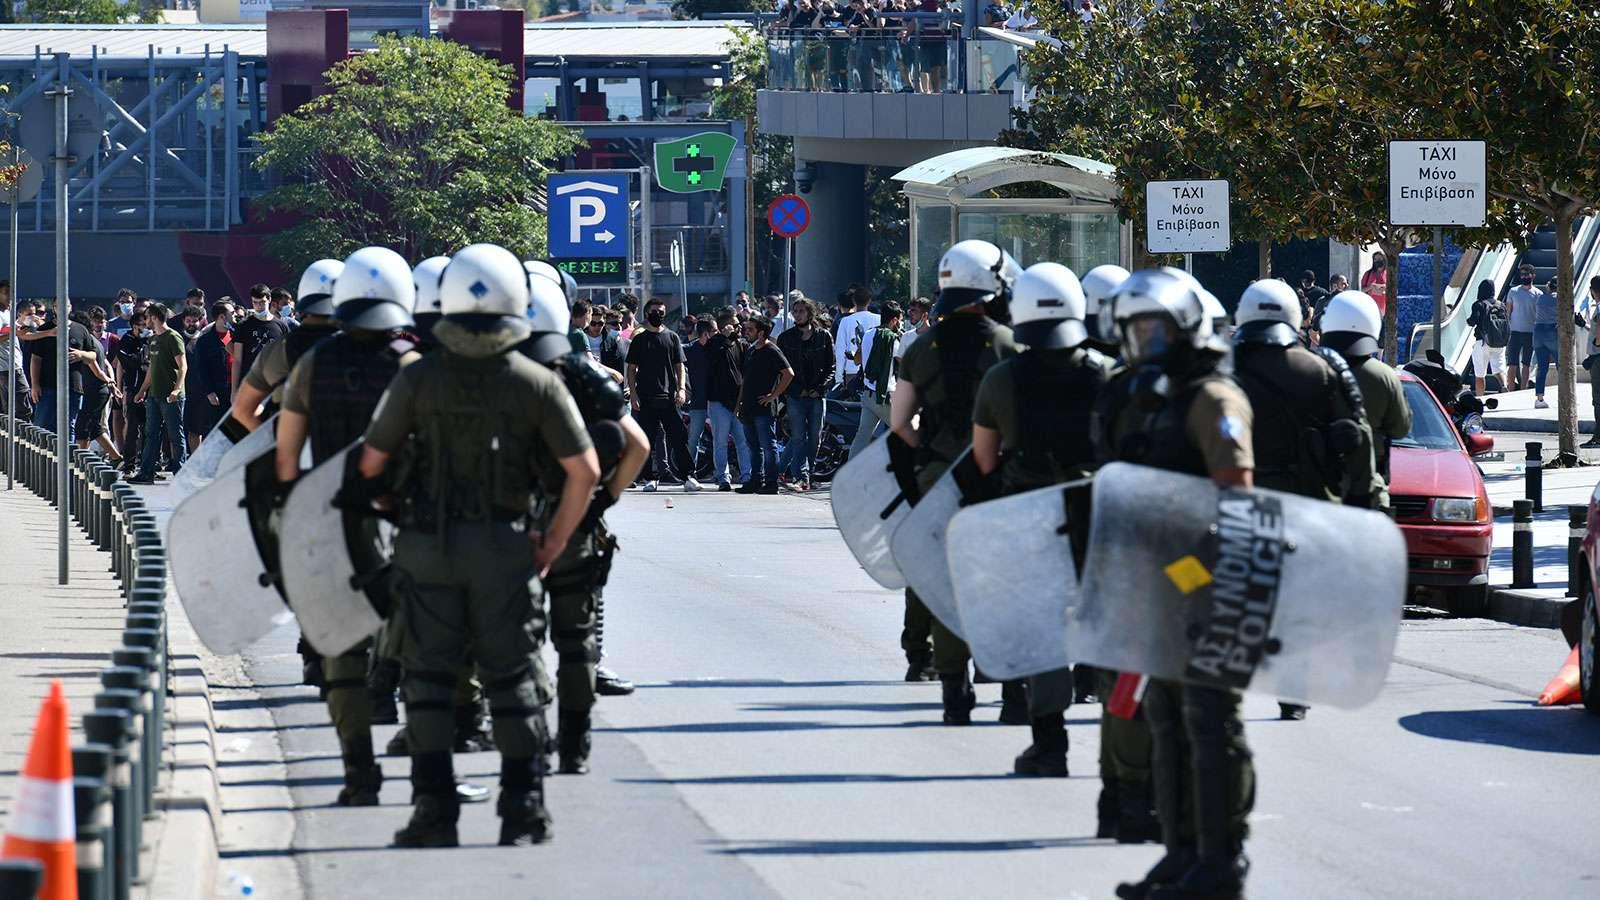 mathites kinitopoiisi mat Η κυβέρνηση έπνιξε με χημικά τη διαδήλωση